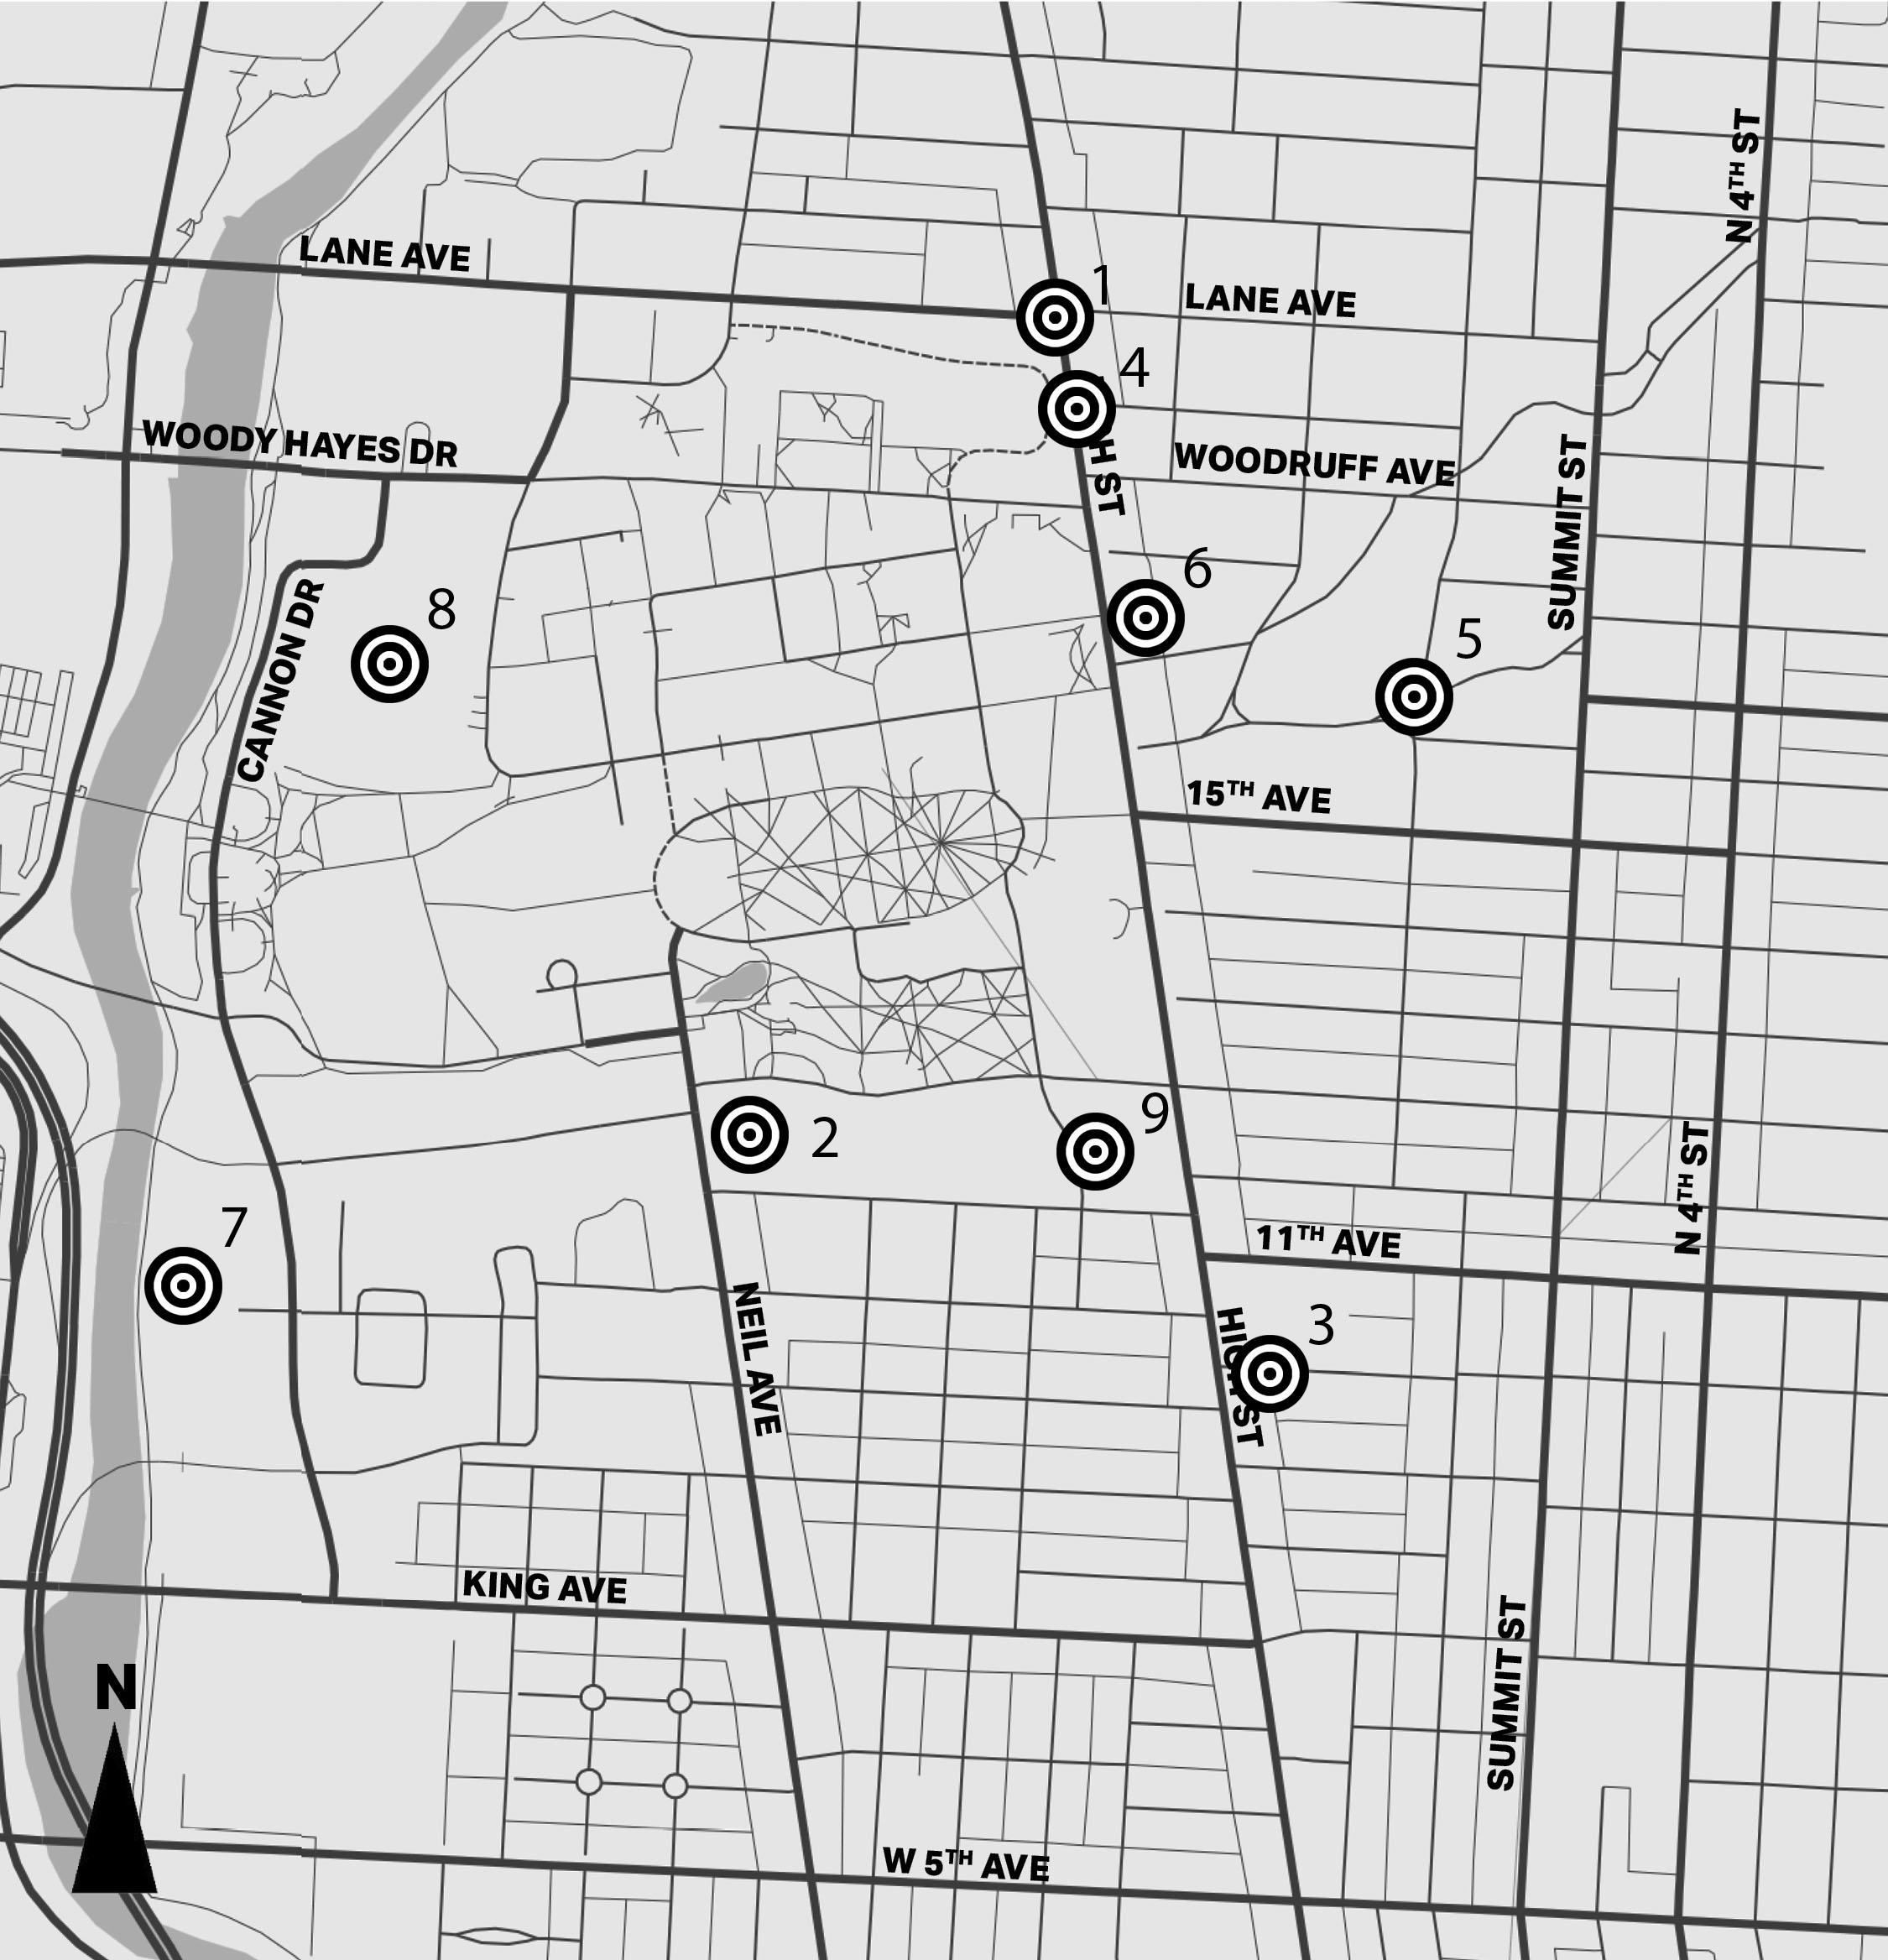 Osu Campus Map   Wiring Diagram Database on osu organizational chart, osu student services, university of iowa parking lot map, osu okmulgee campus, osu career services, osu athletics, osu stillwater oklahoma, osu email, osu west campus, osu on campus housing, osu career center, osu bookstore, osu north campus, osu lima campus, osu campus union, osu campus overview, osu beat michigan week, osu campus life, ohio state building map,